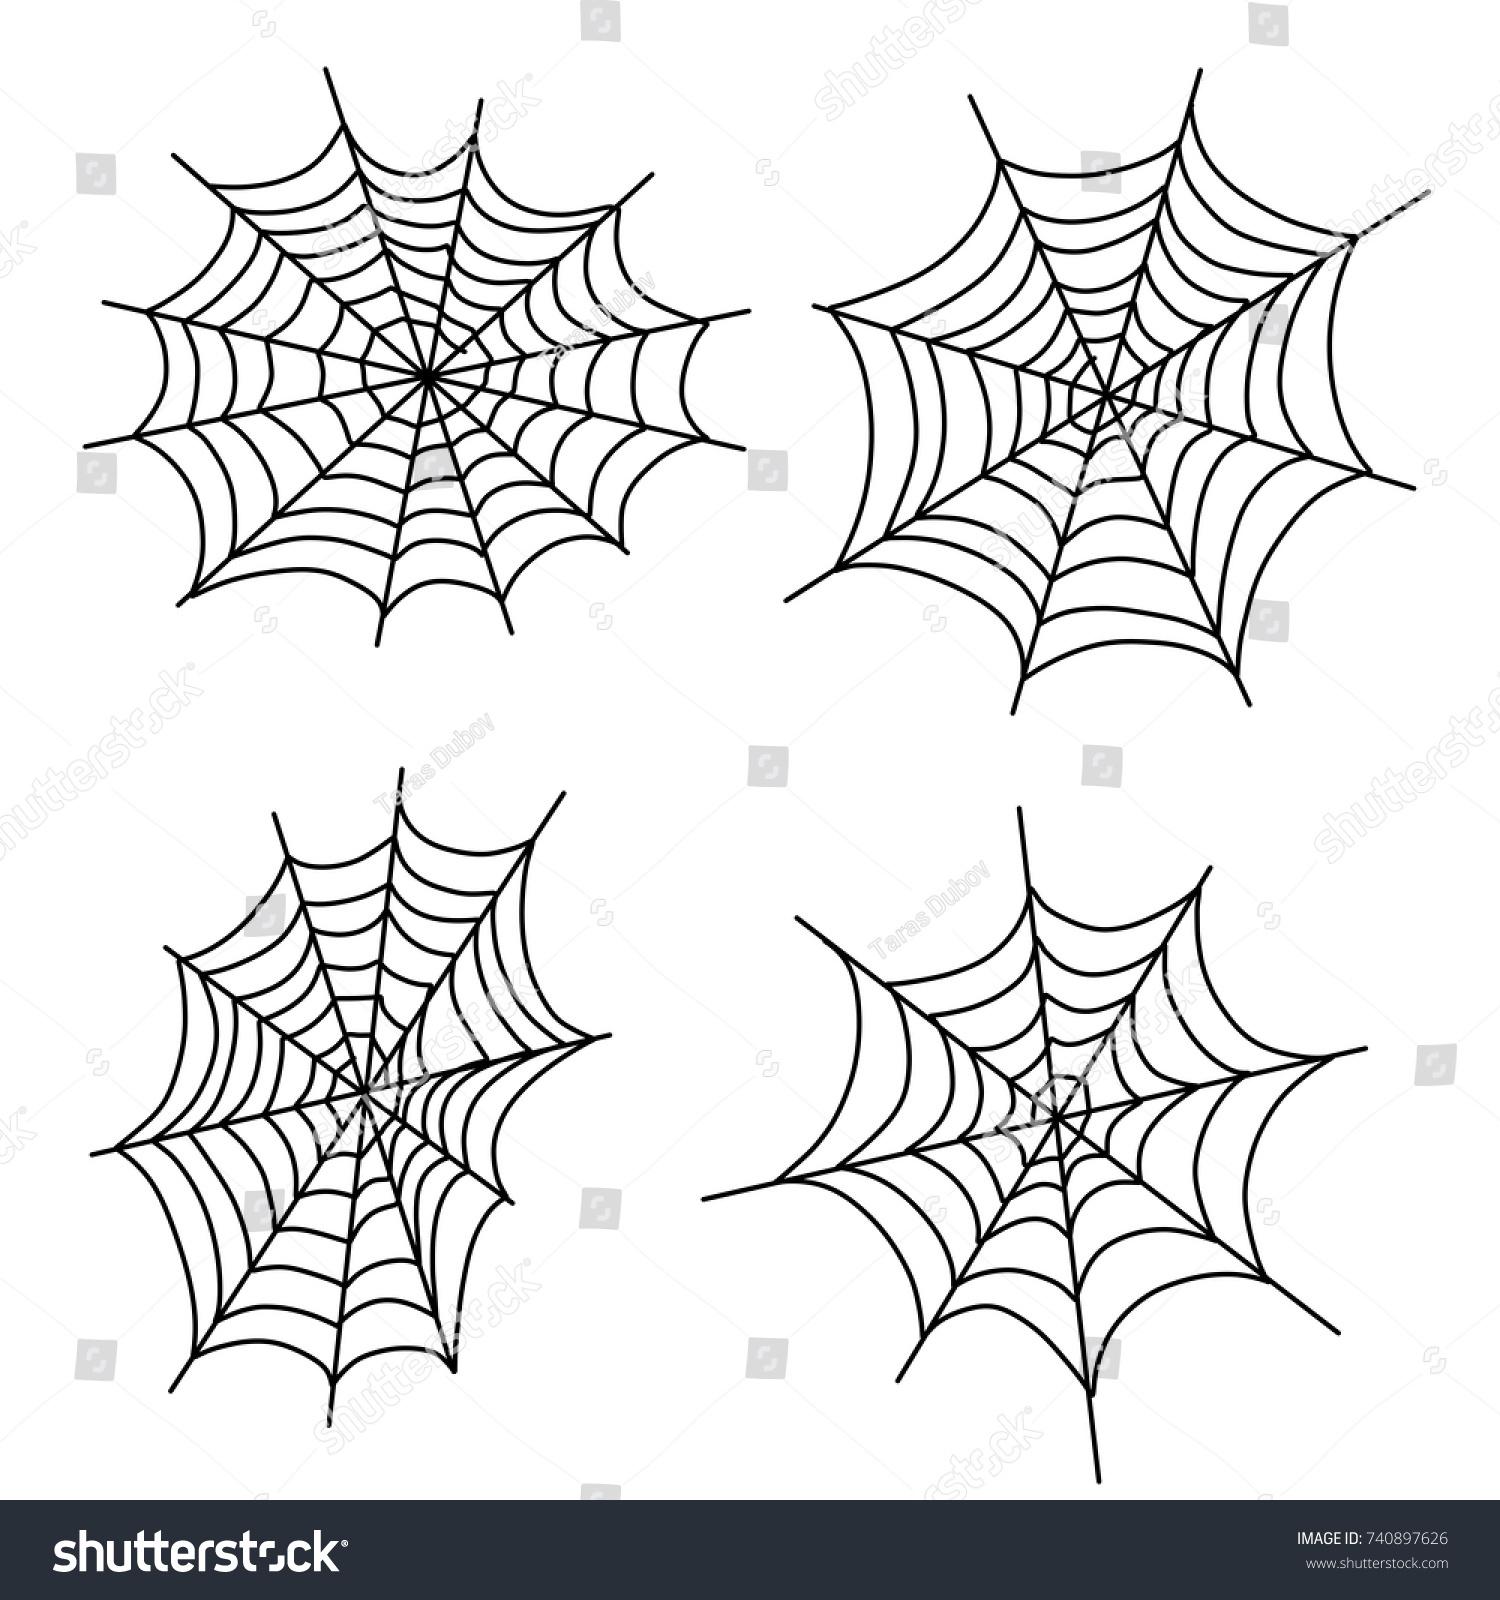 cartoon illustration decoration halloween spiderweb spider stock